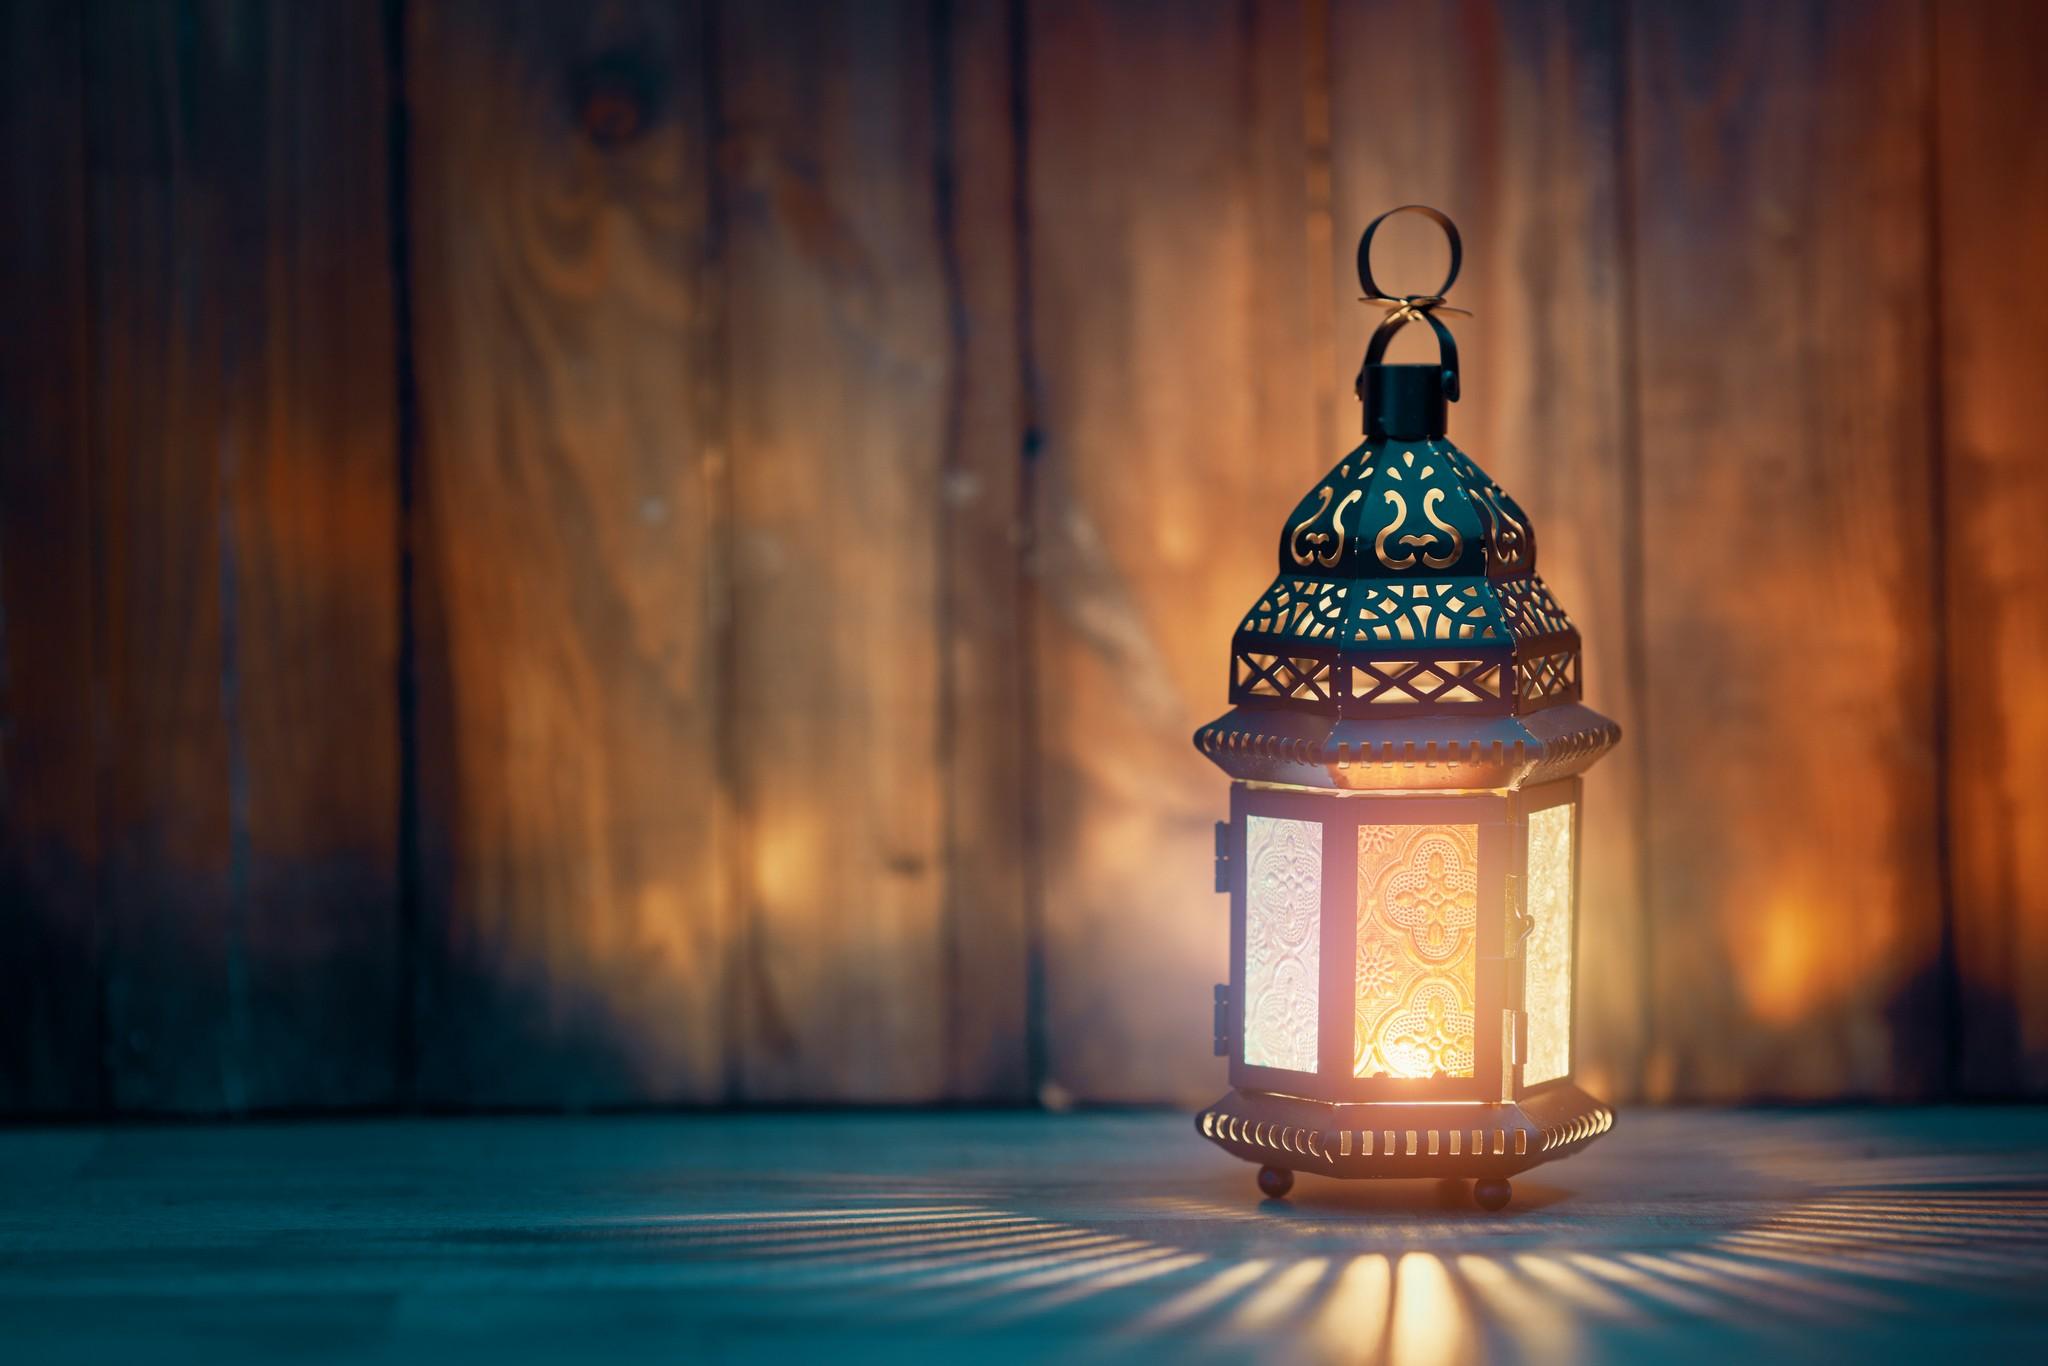 Antara Ahlussunnah Wal Jama'ah Dengan Manhaj Salaf